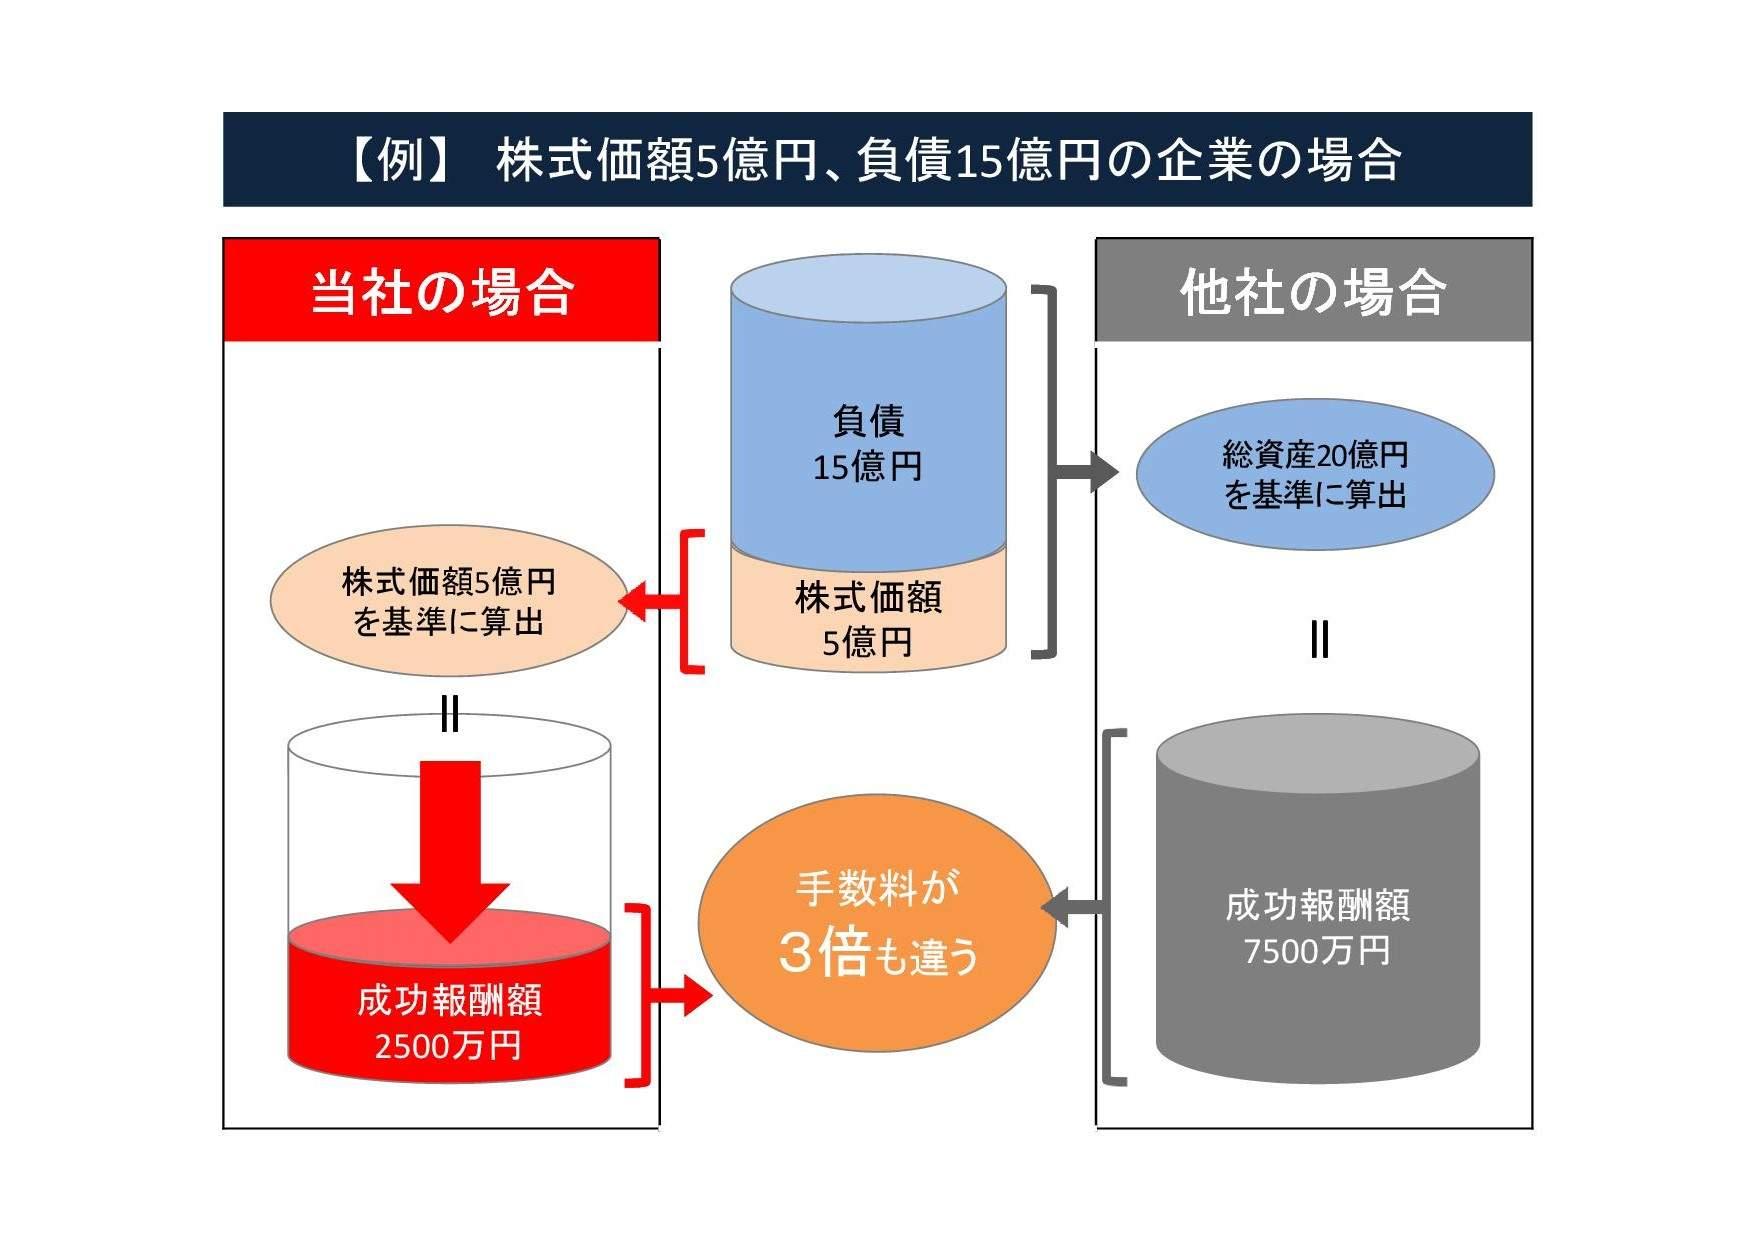 Microsoft PowerPoint - 株式価額5億円、負債15億円の企業の場合[読み取り専用]